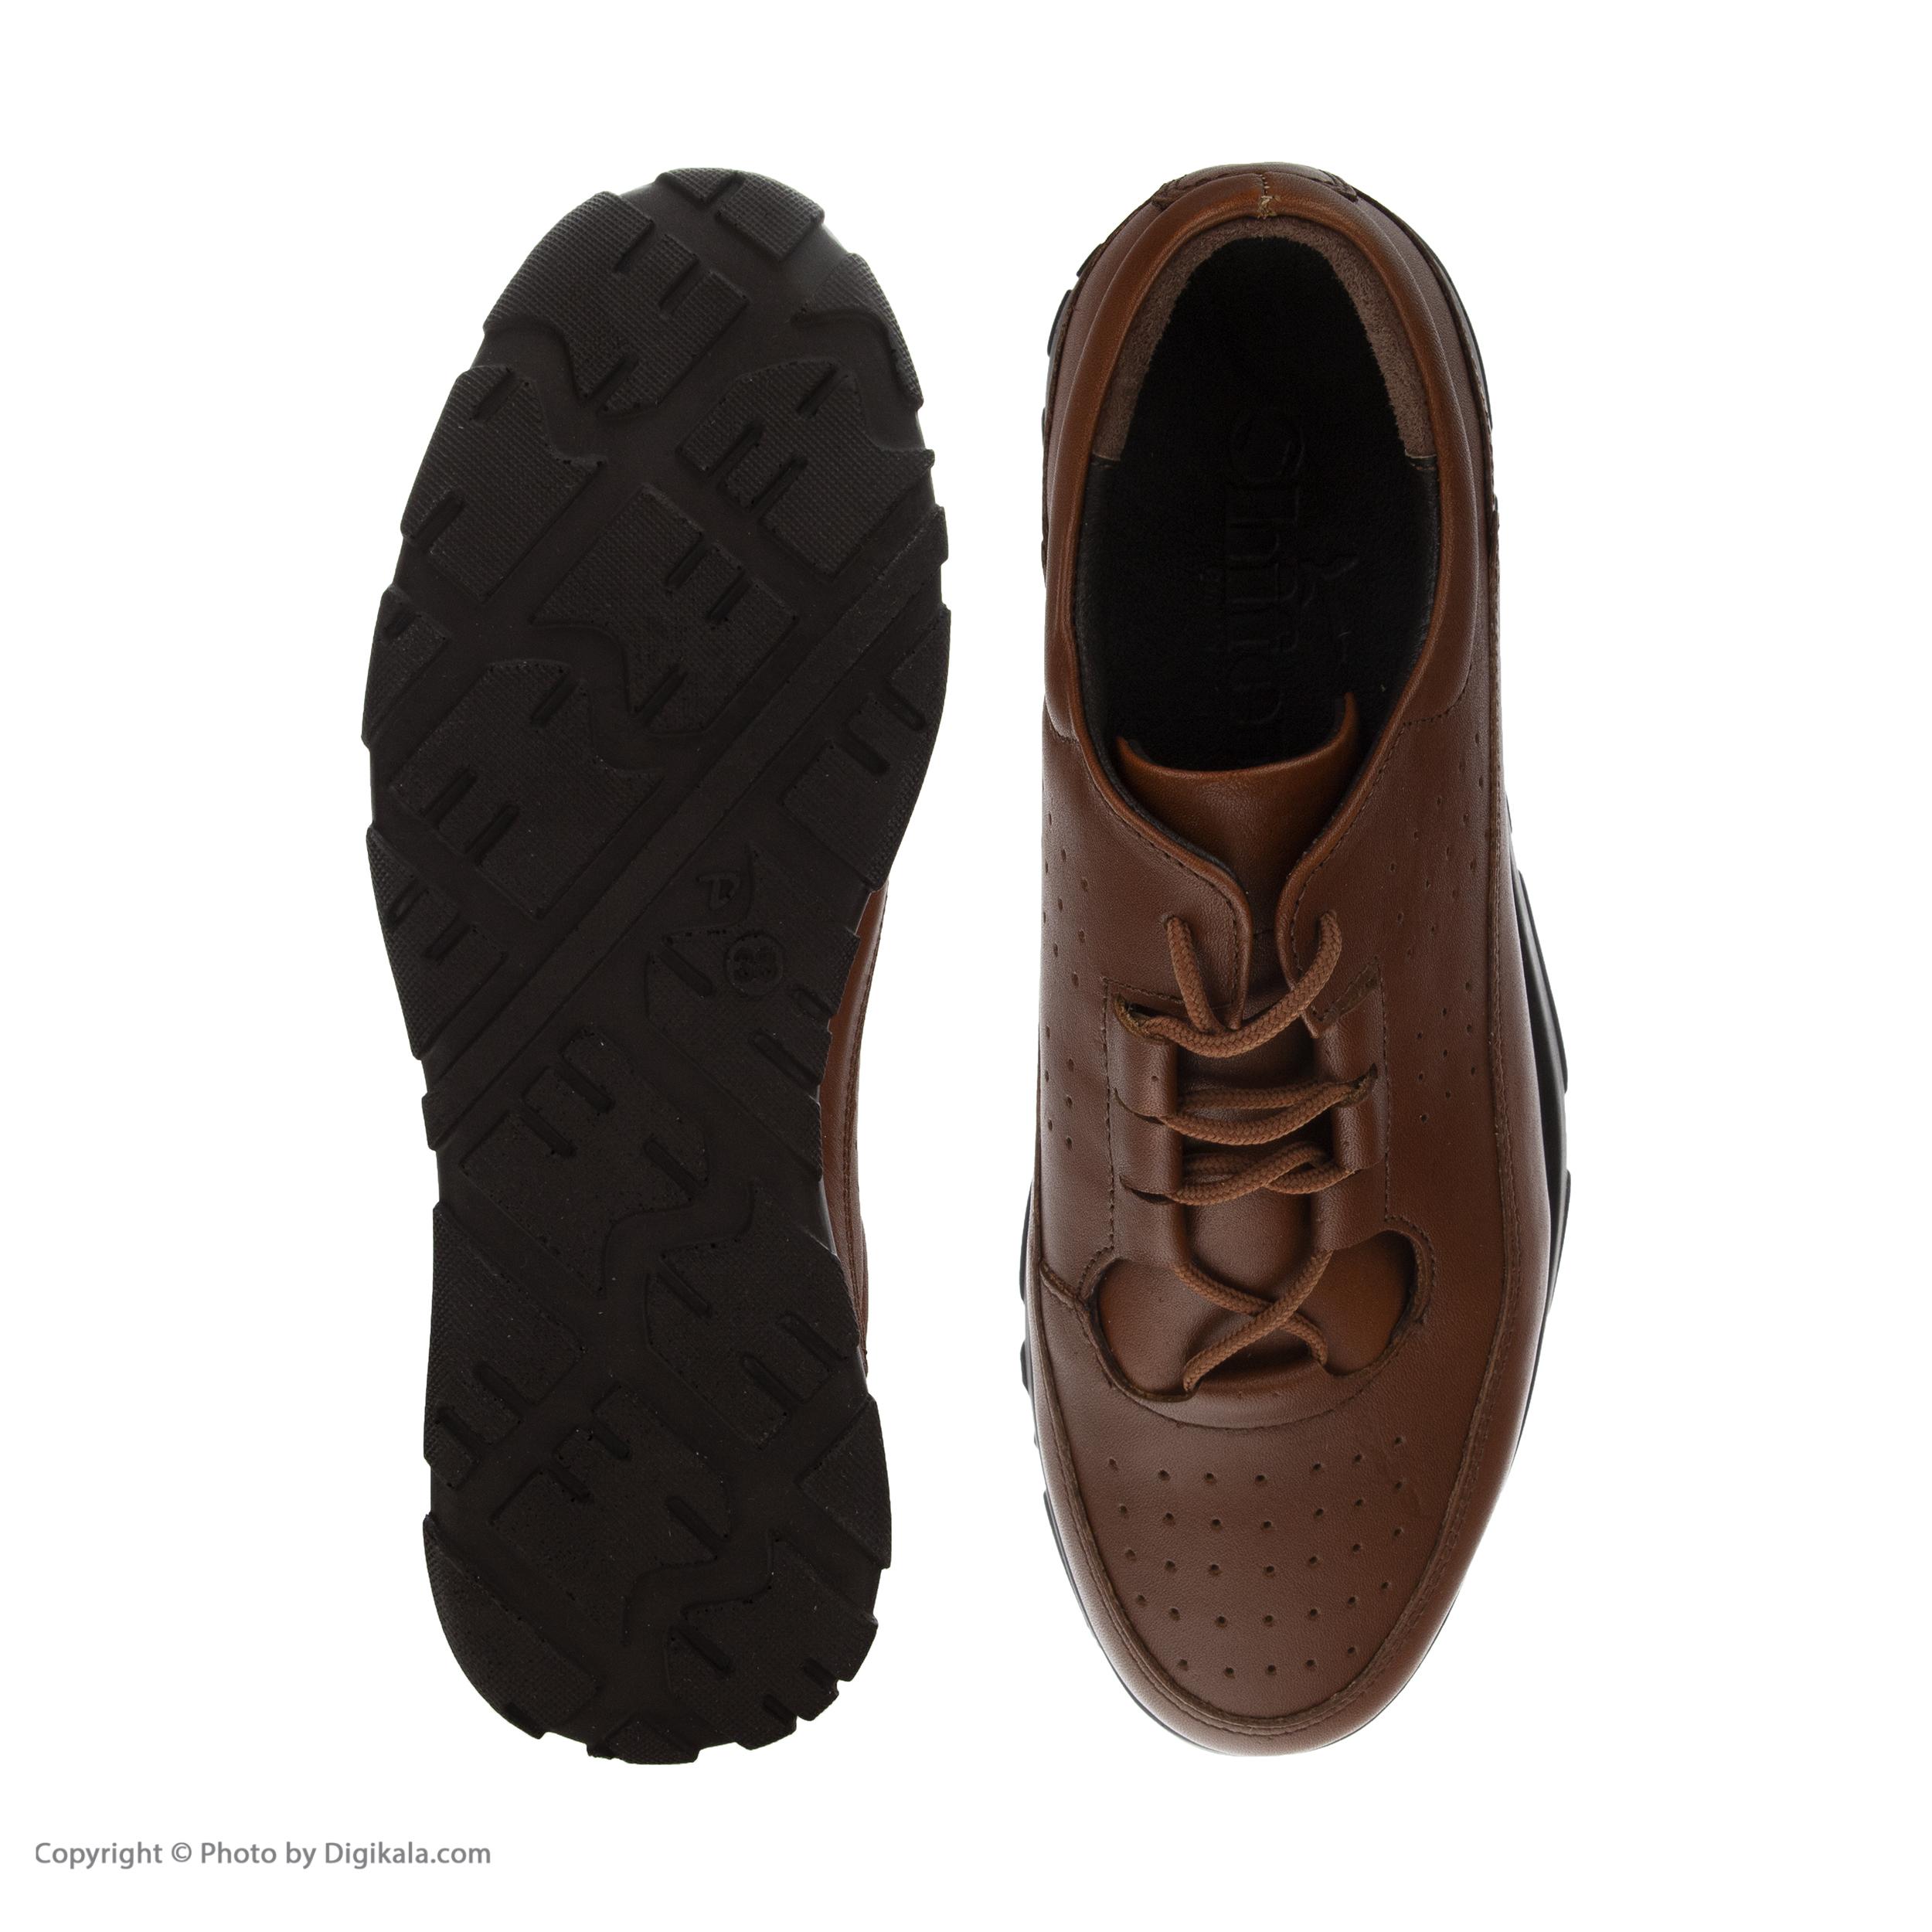 کفش روزمره زنانه شیفر مدل 5289A500136 -  - 5